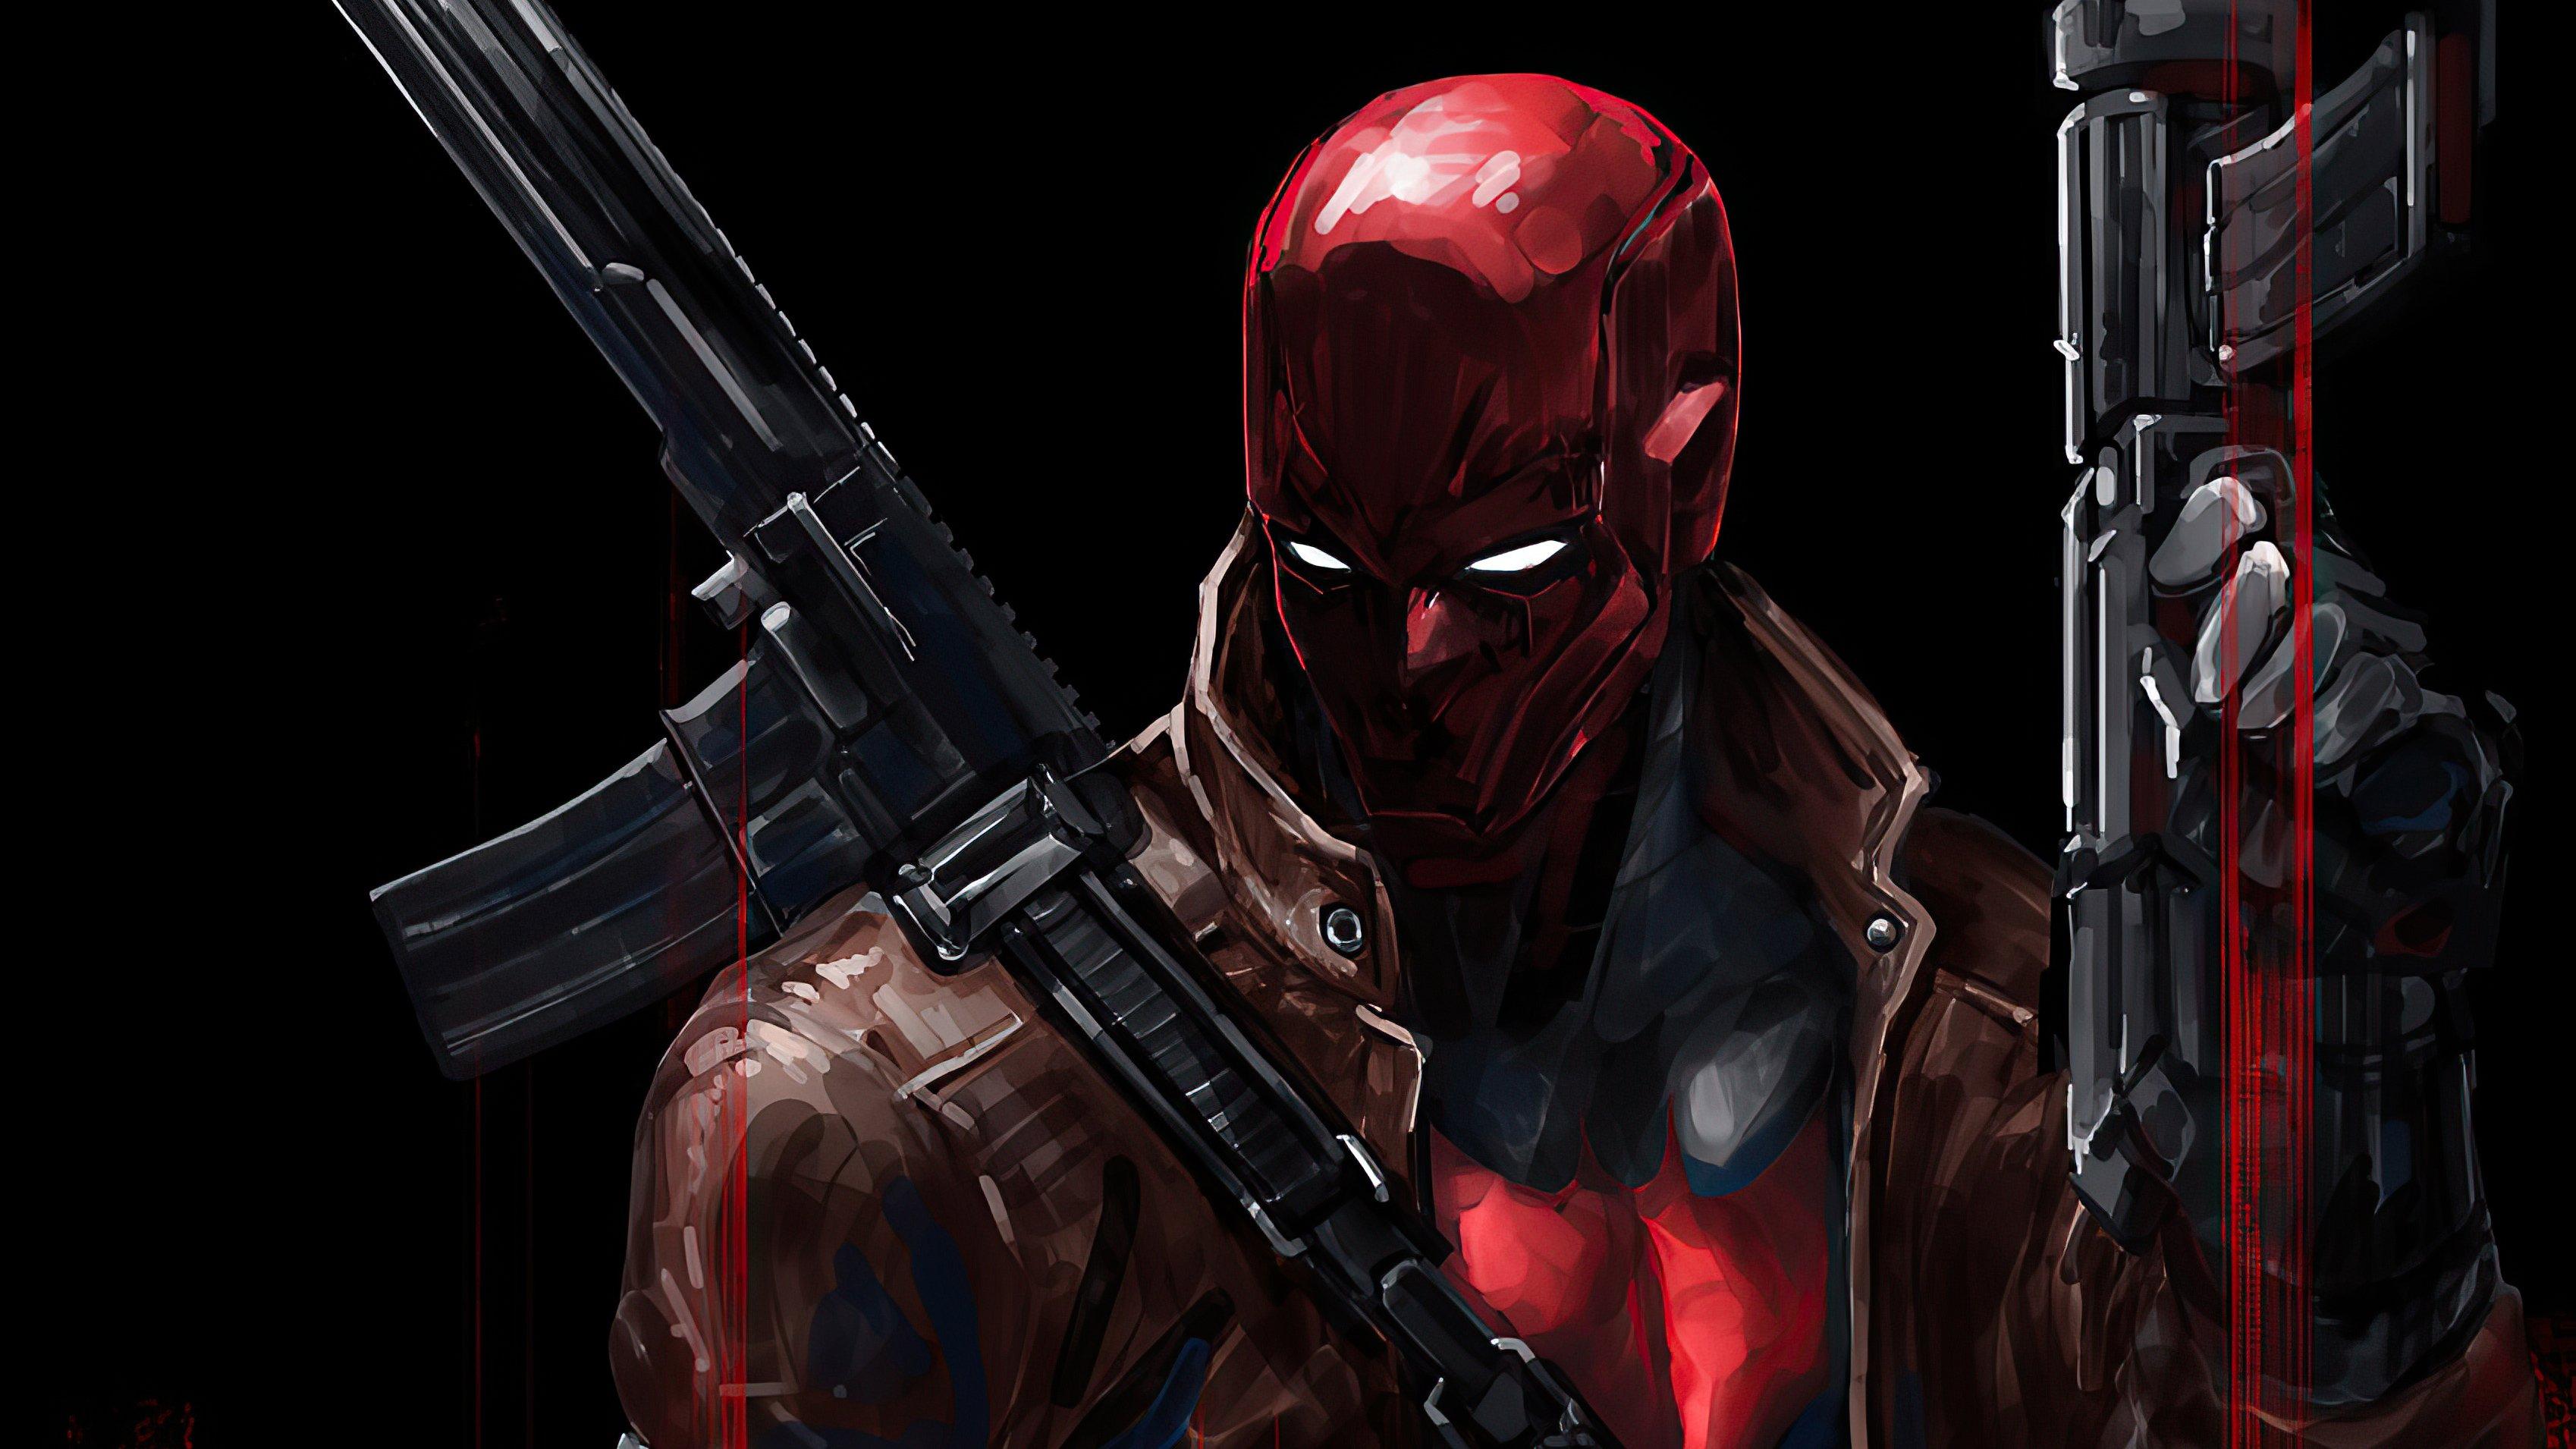 Fondos de pantalla Capucha roja con arma